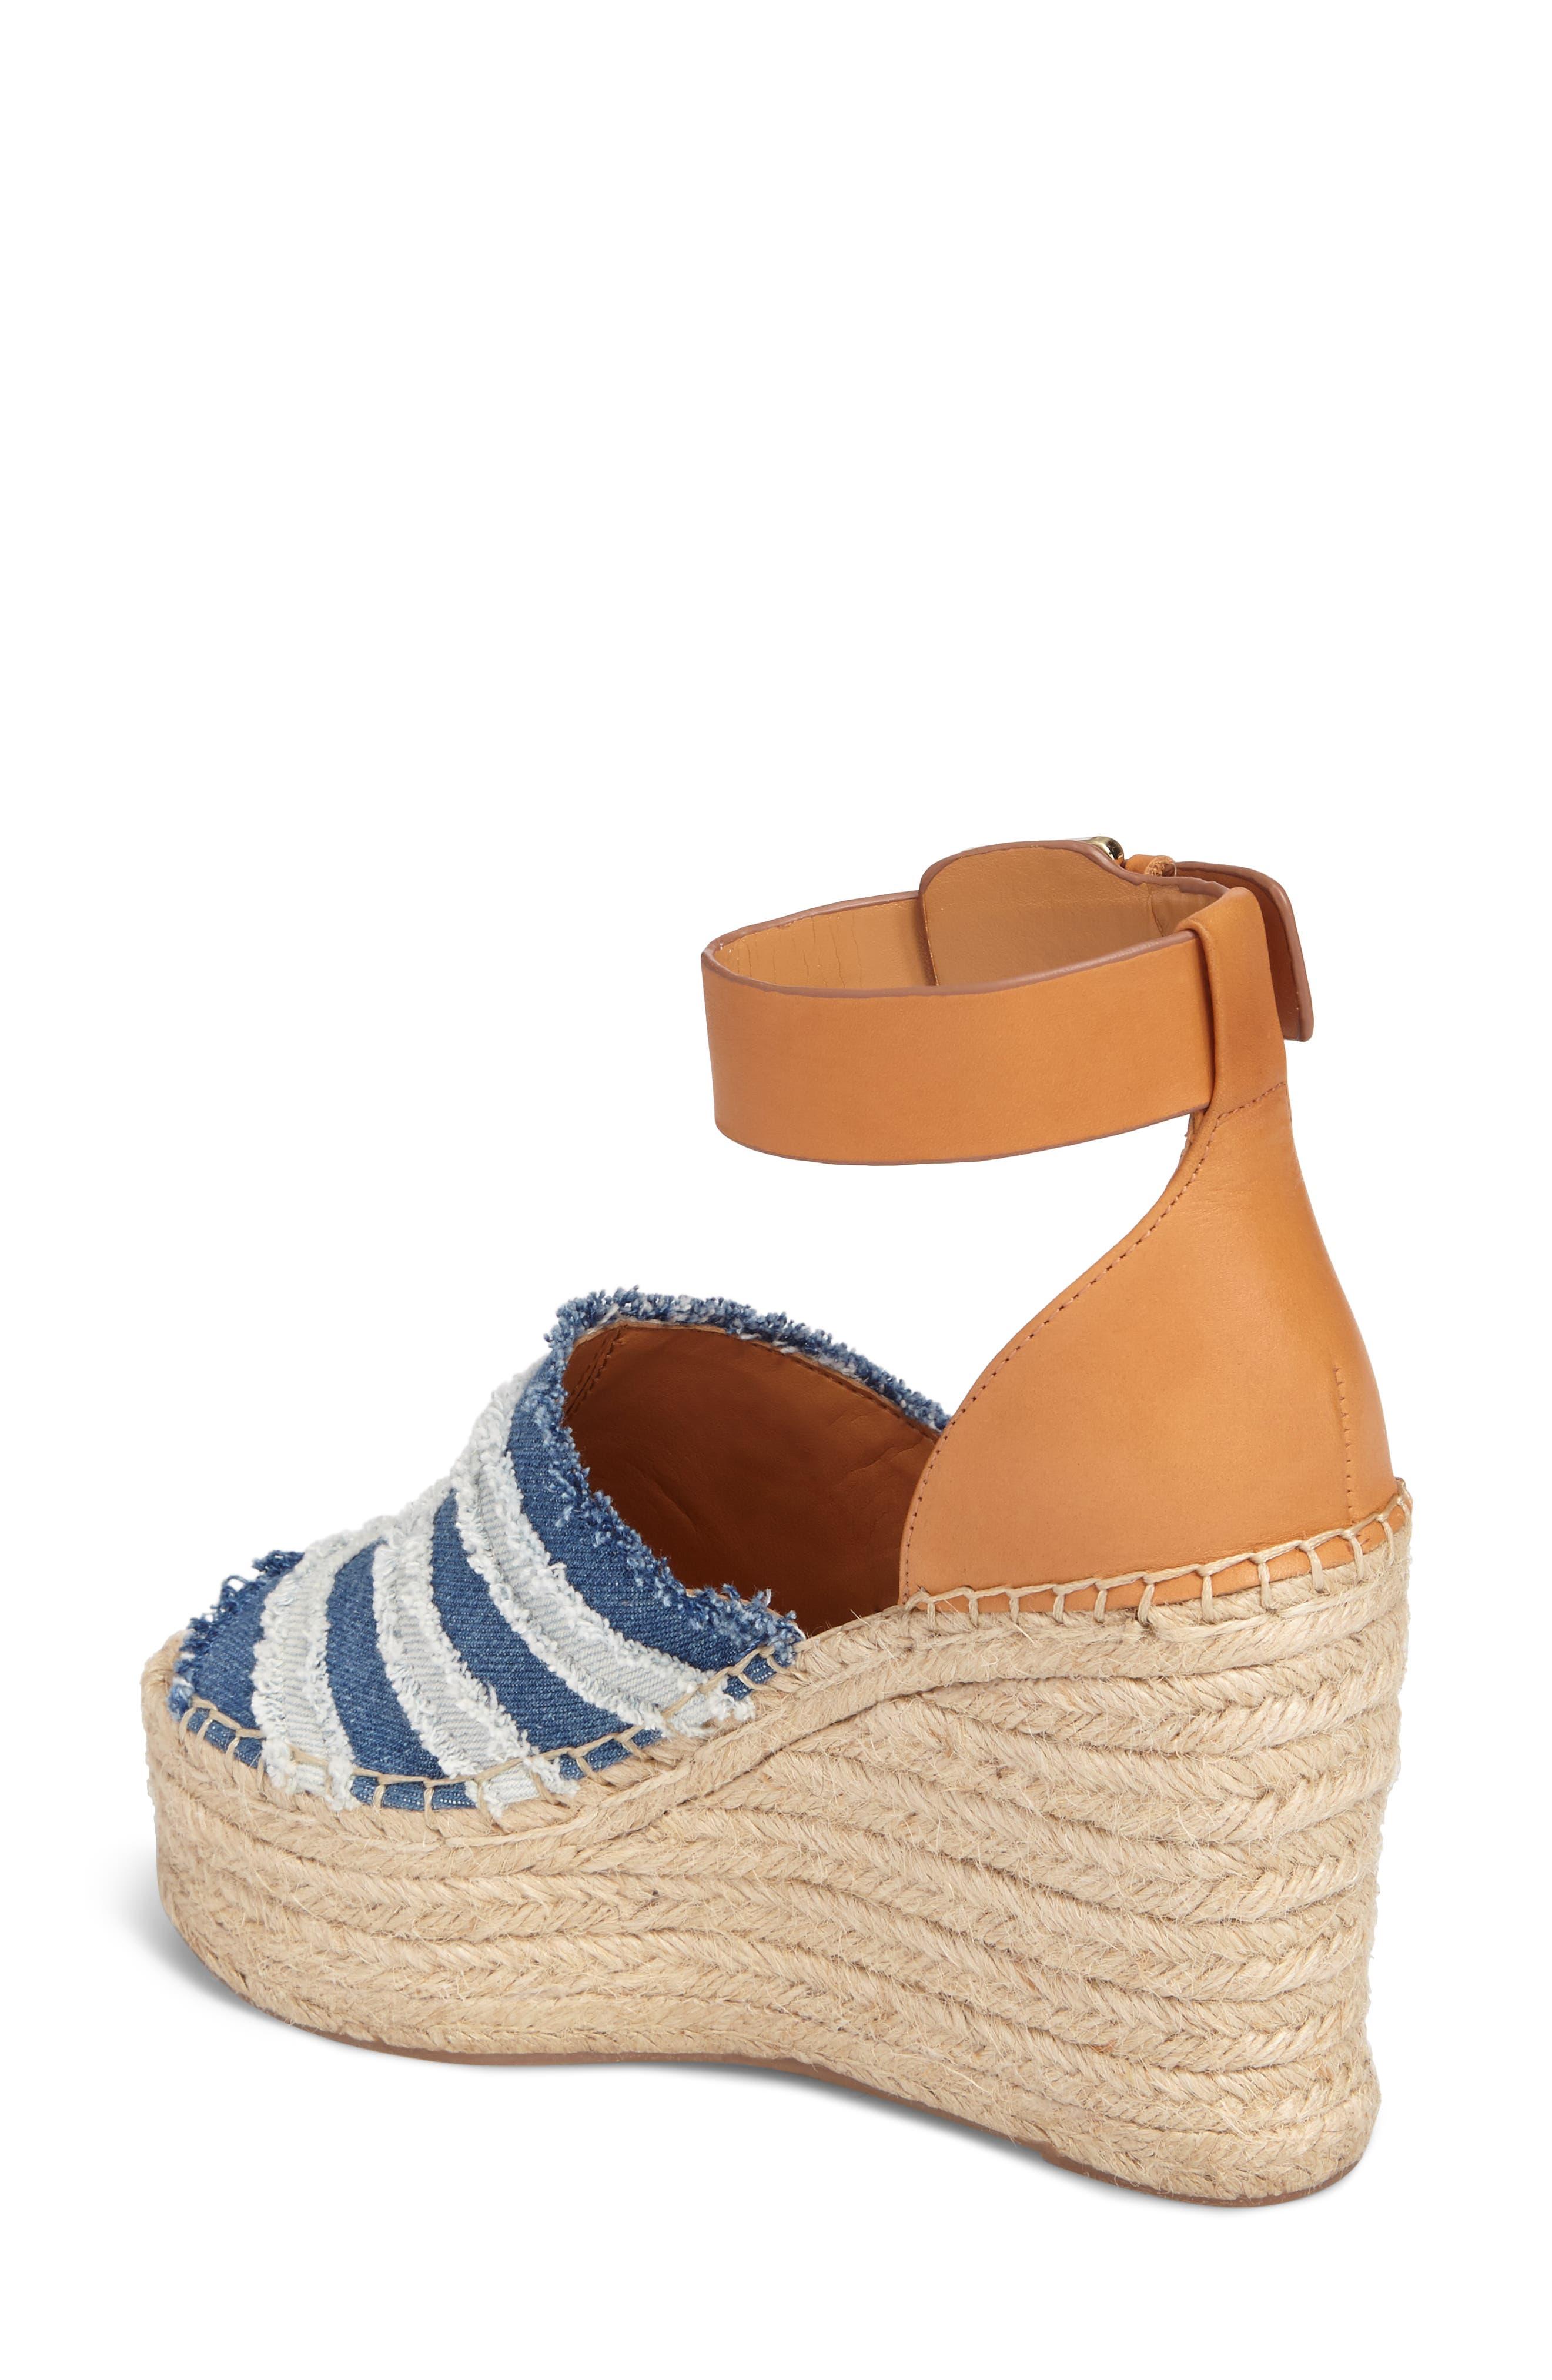 Adria Wedge Sandal,                             Alternate thumbnail 2, color,